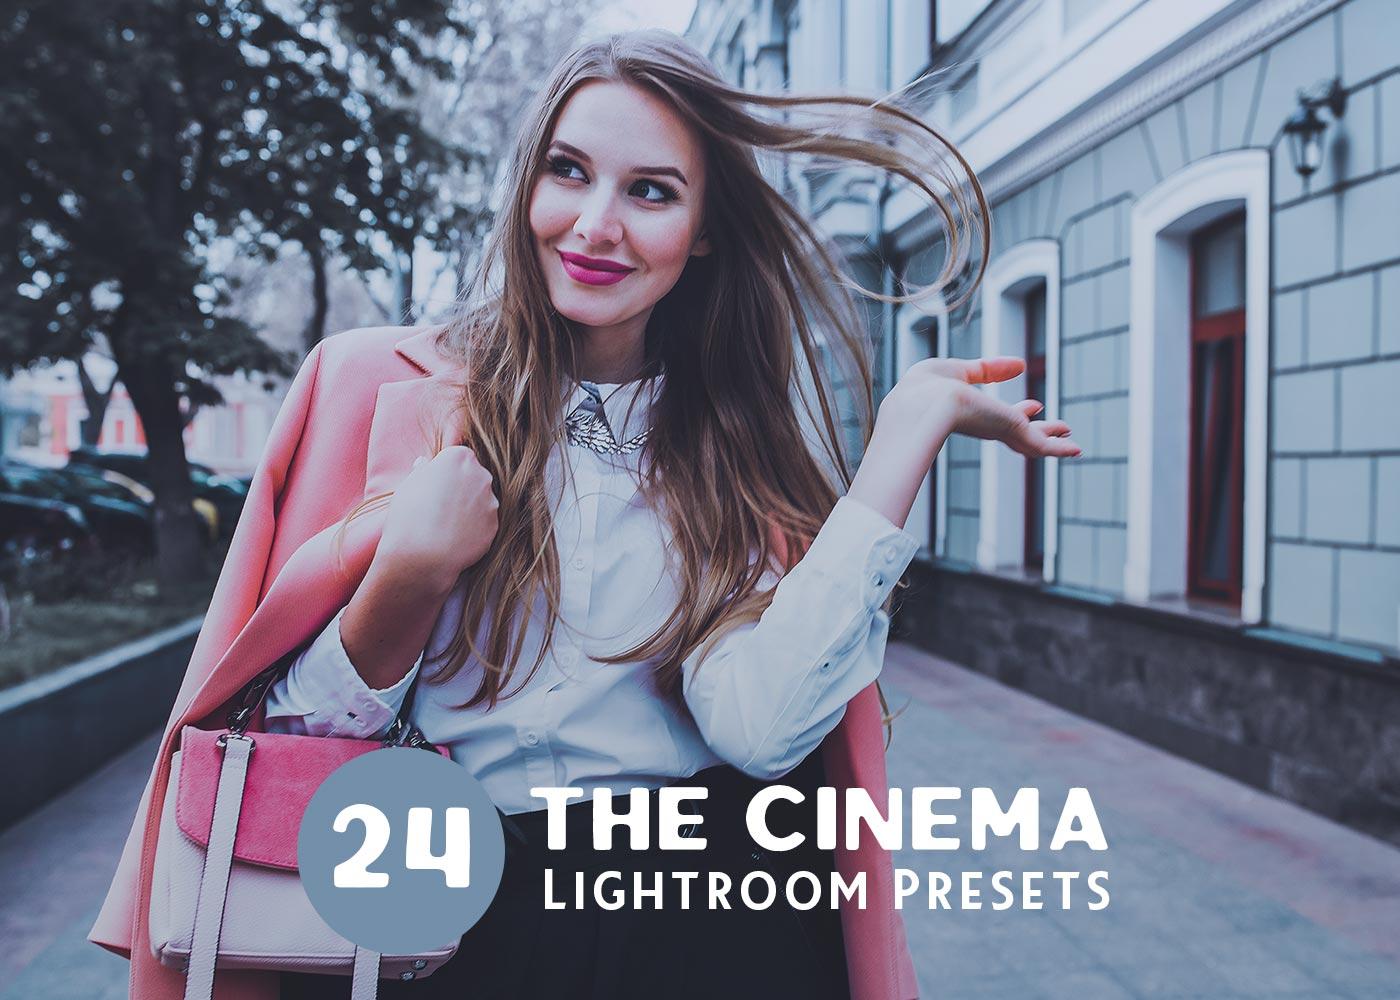 lightroom mobile presets feature the cinema